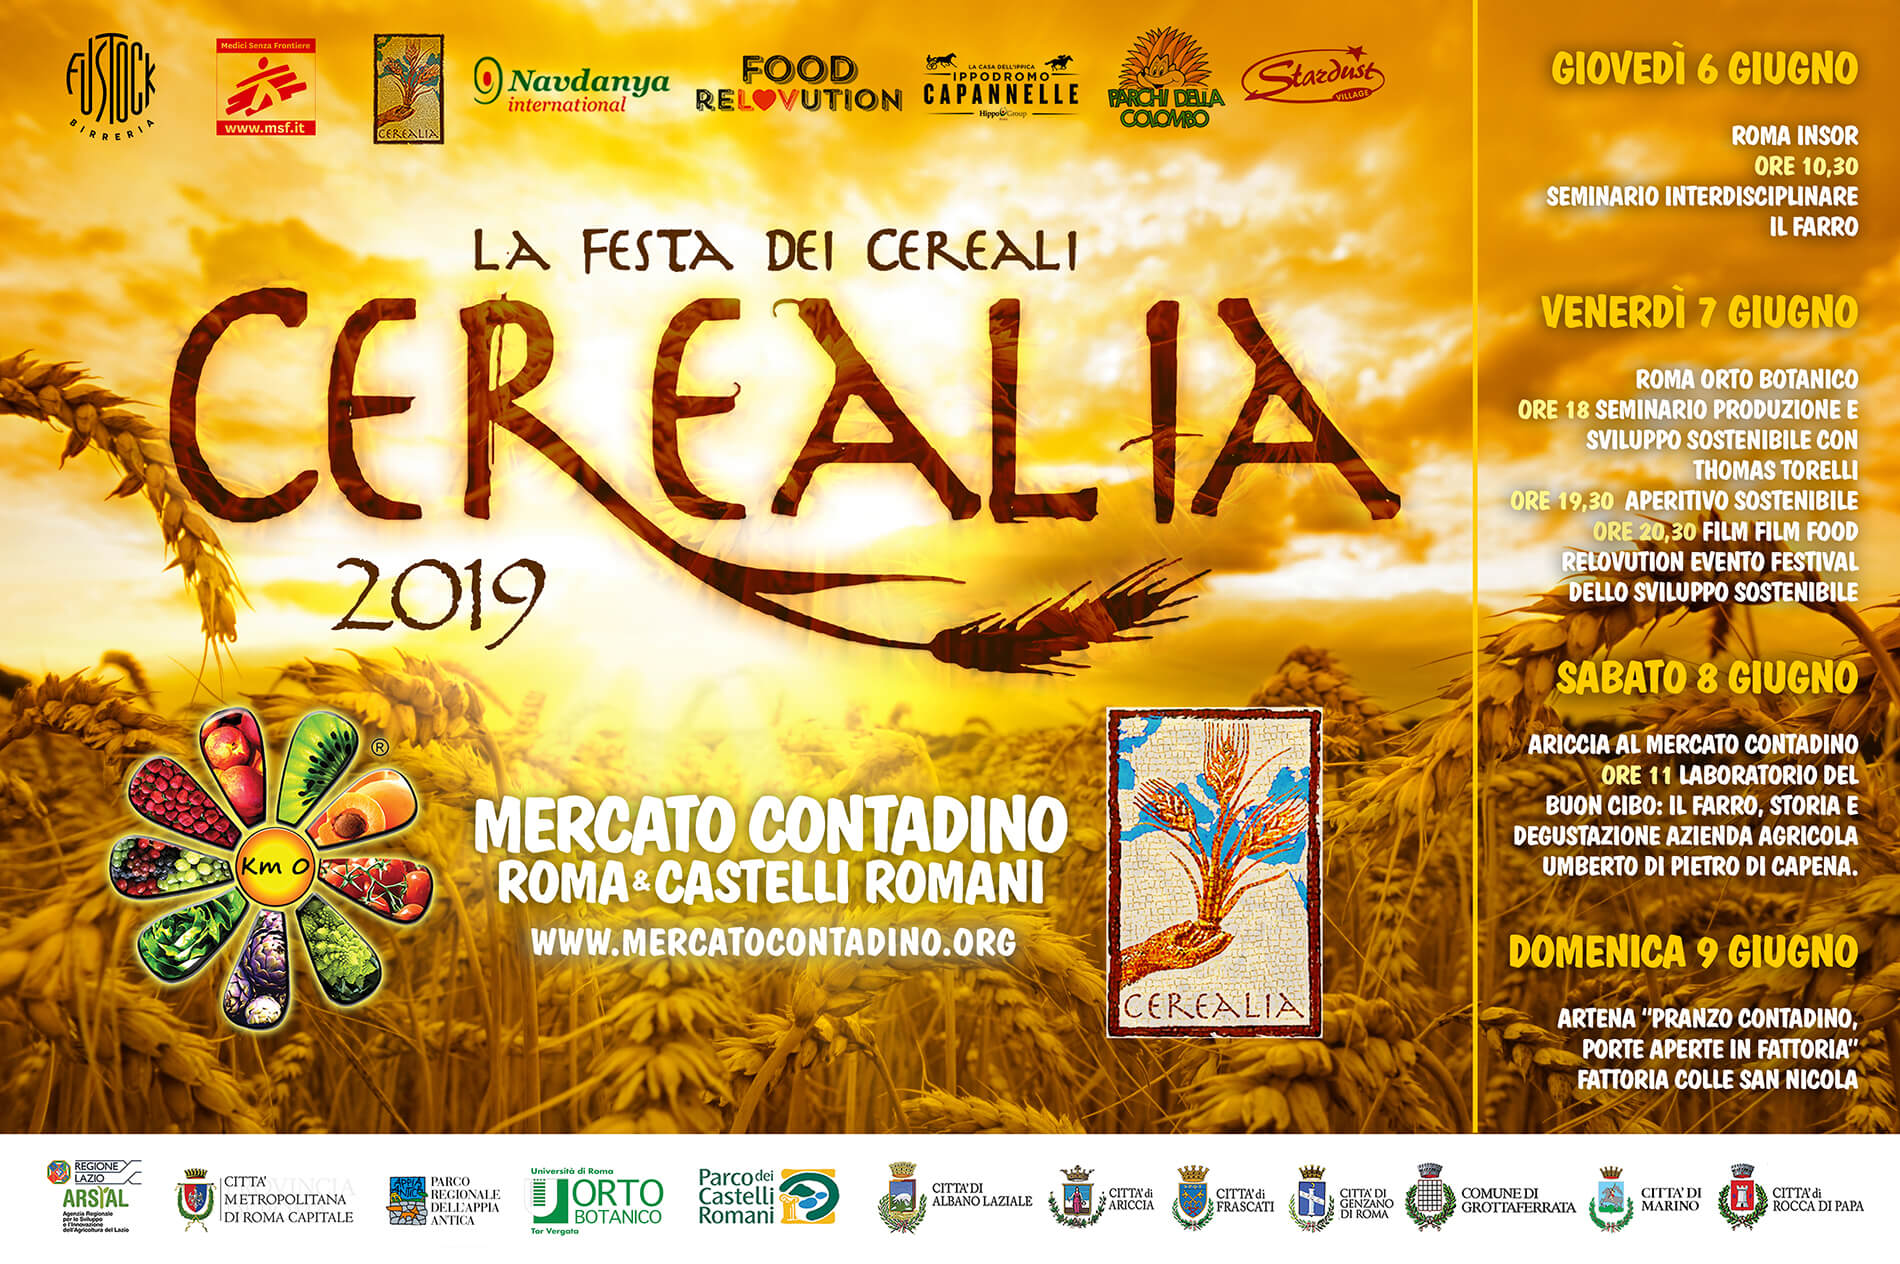 Cerealia 2019